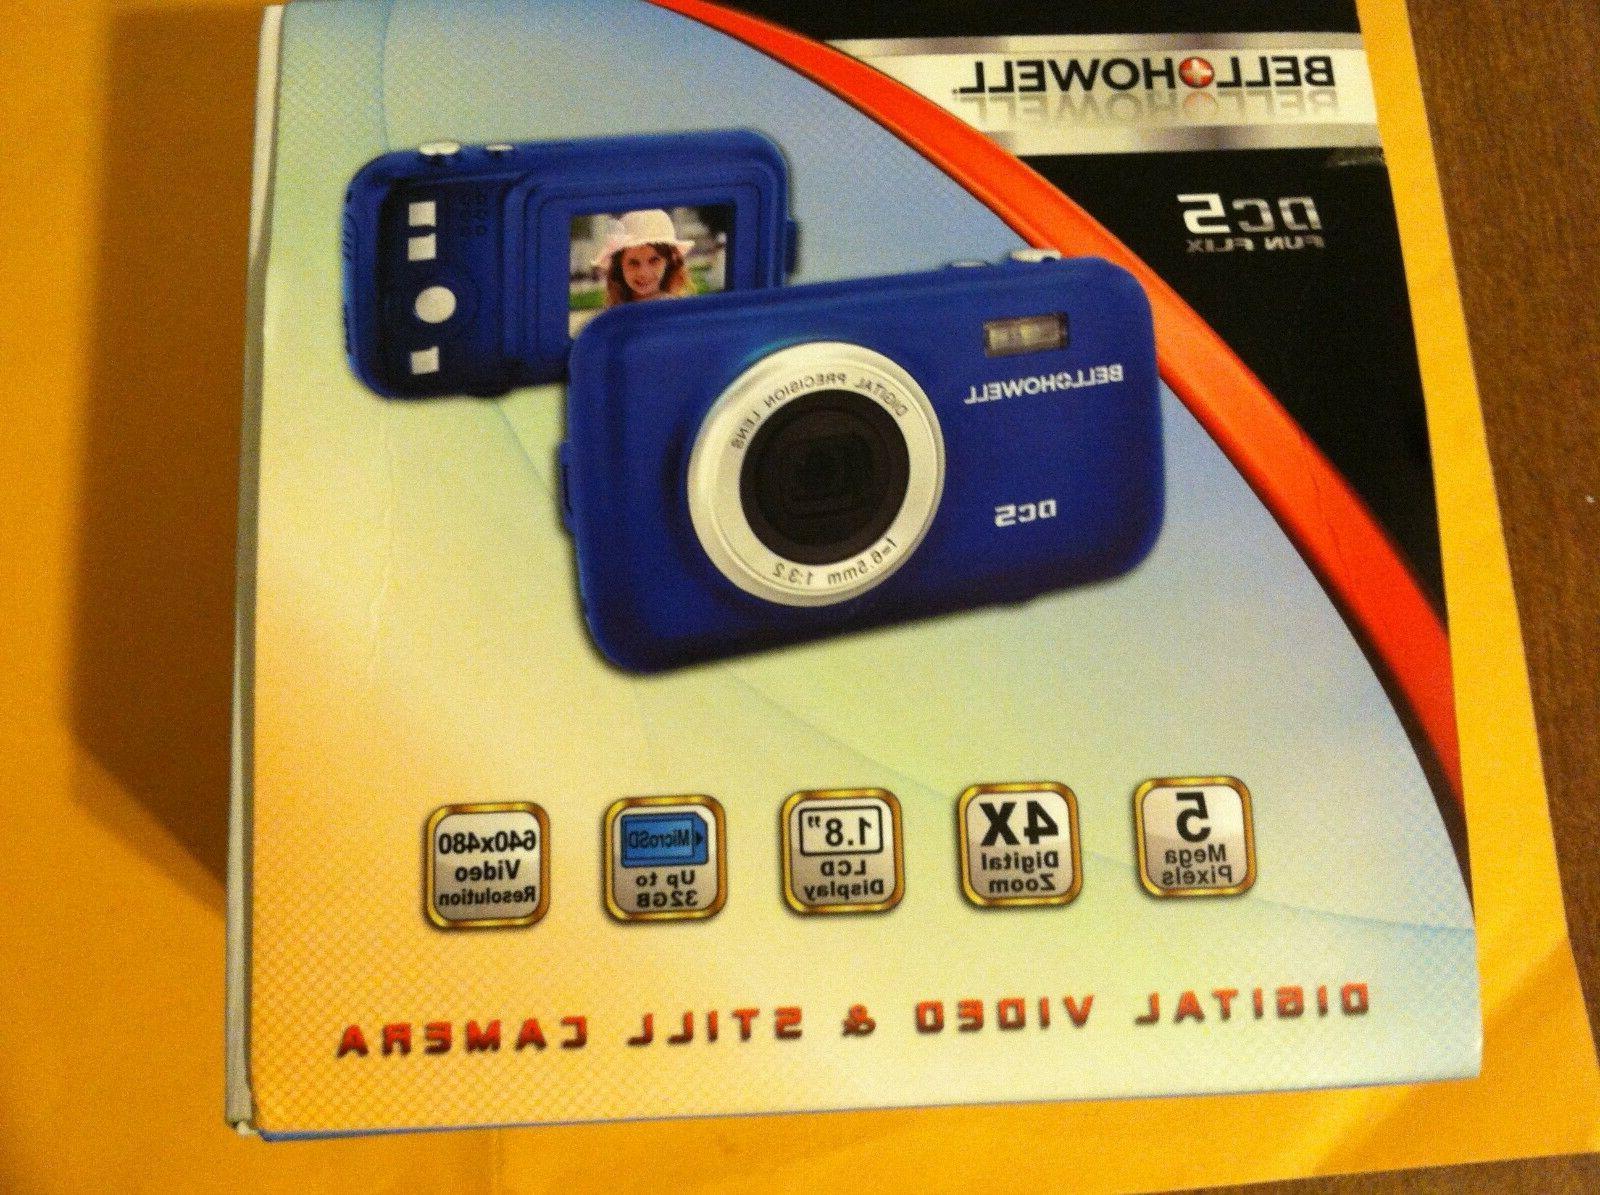 dc5 fun flix 5 0mp digital camera